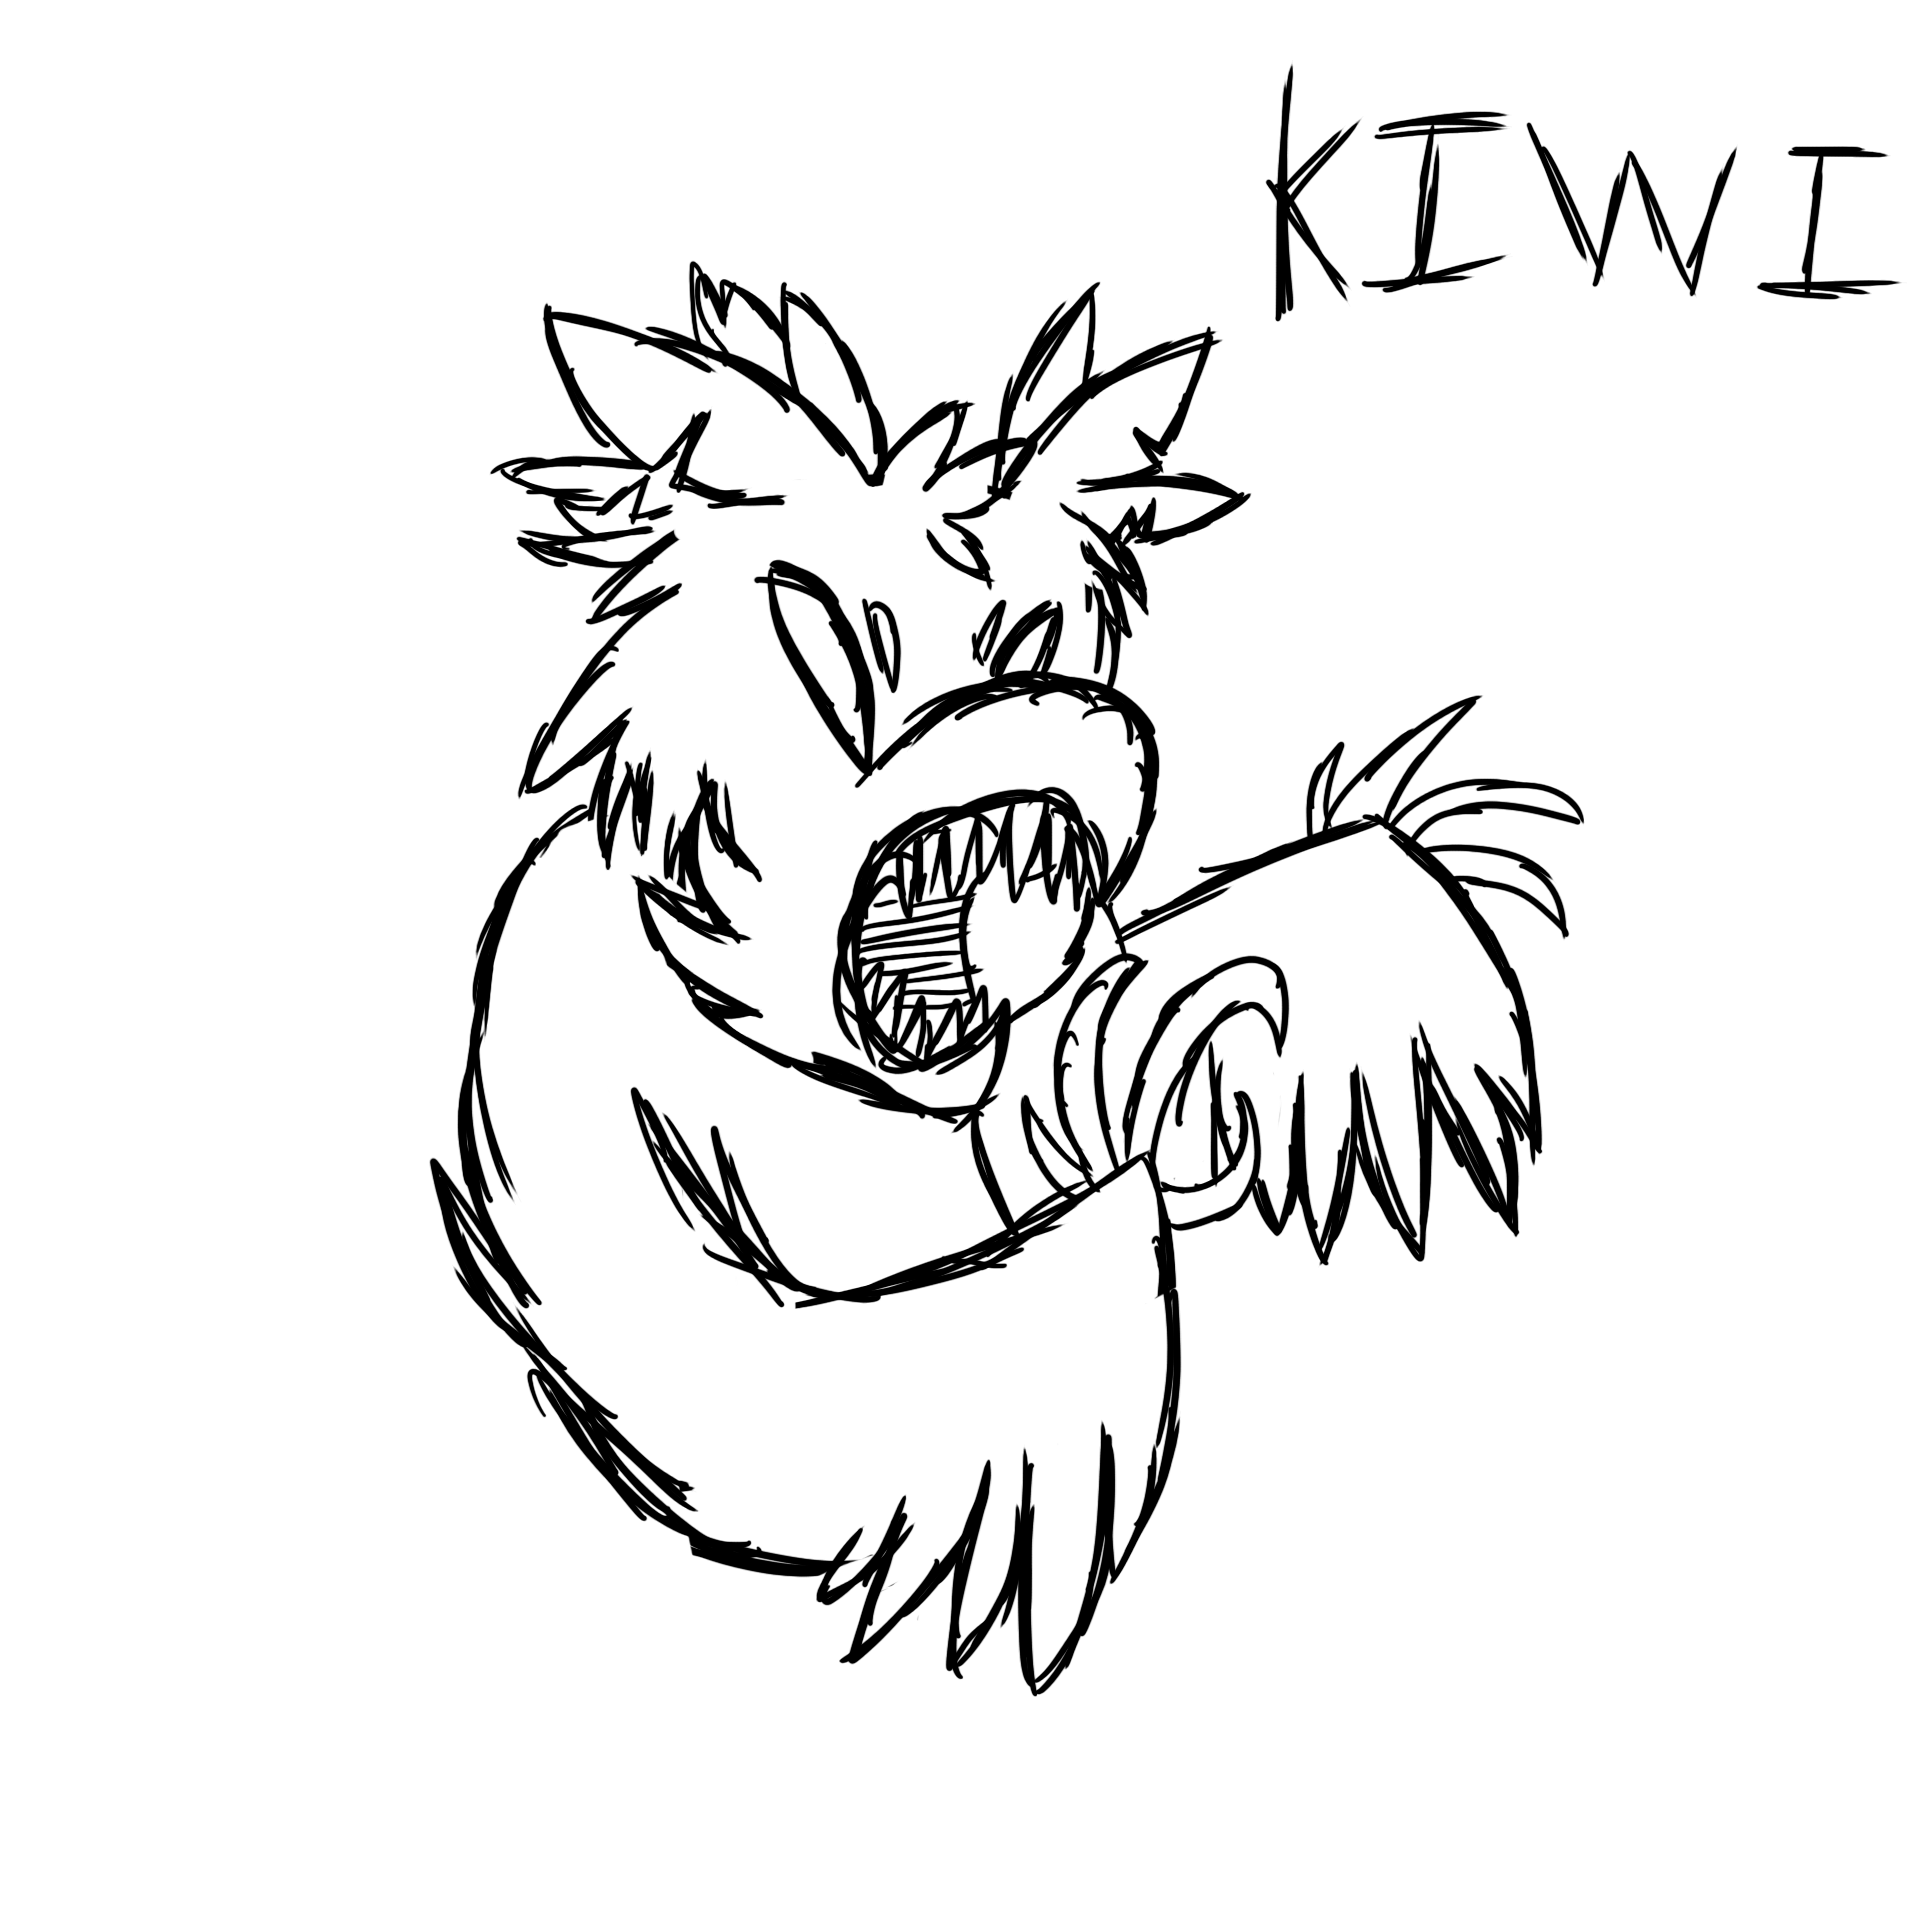 The Deadly Kiwi Bird By Neverexusleft On Newgrounds